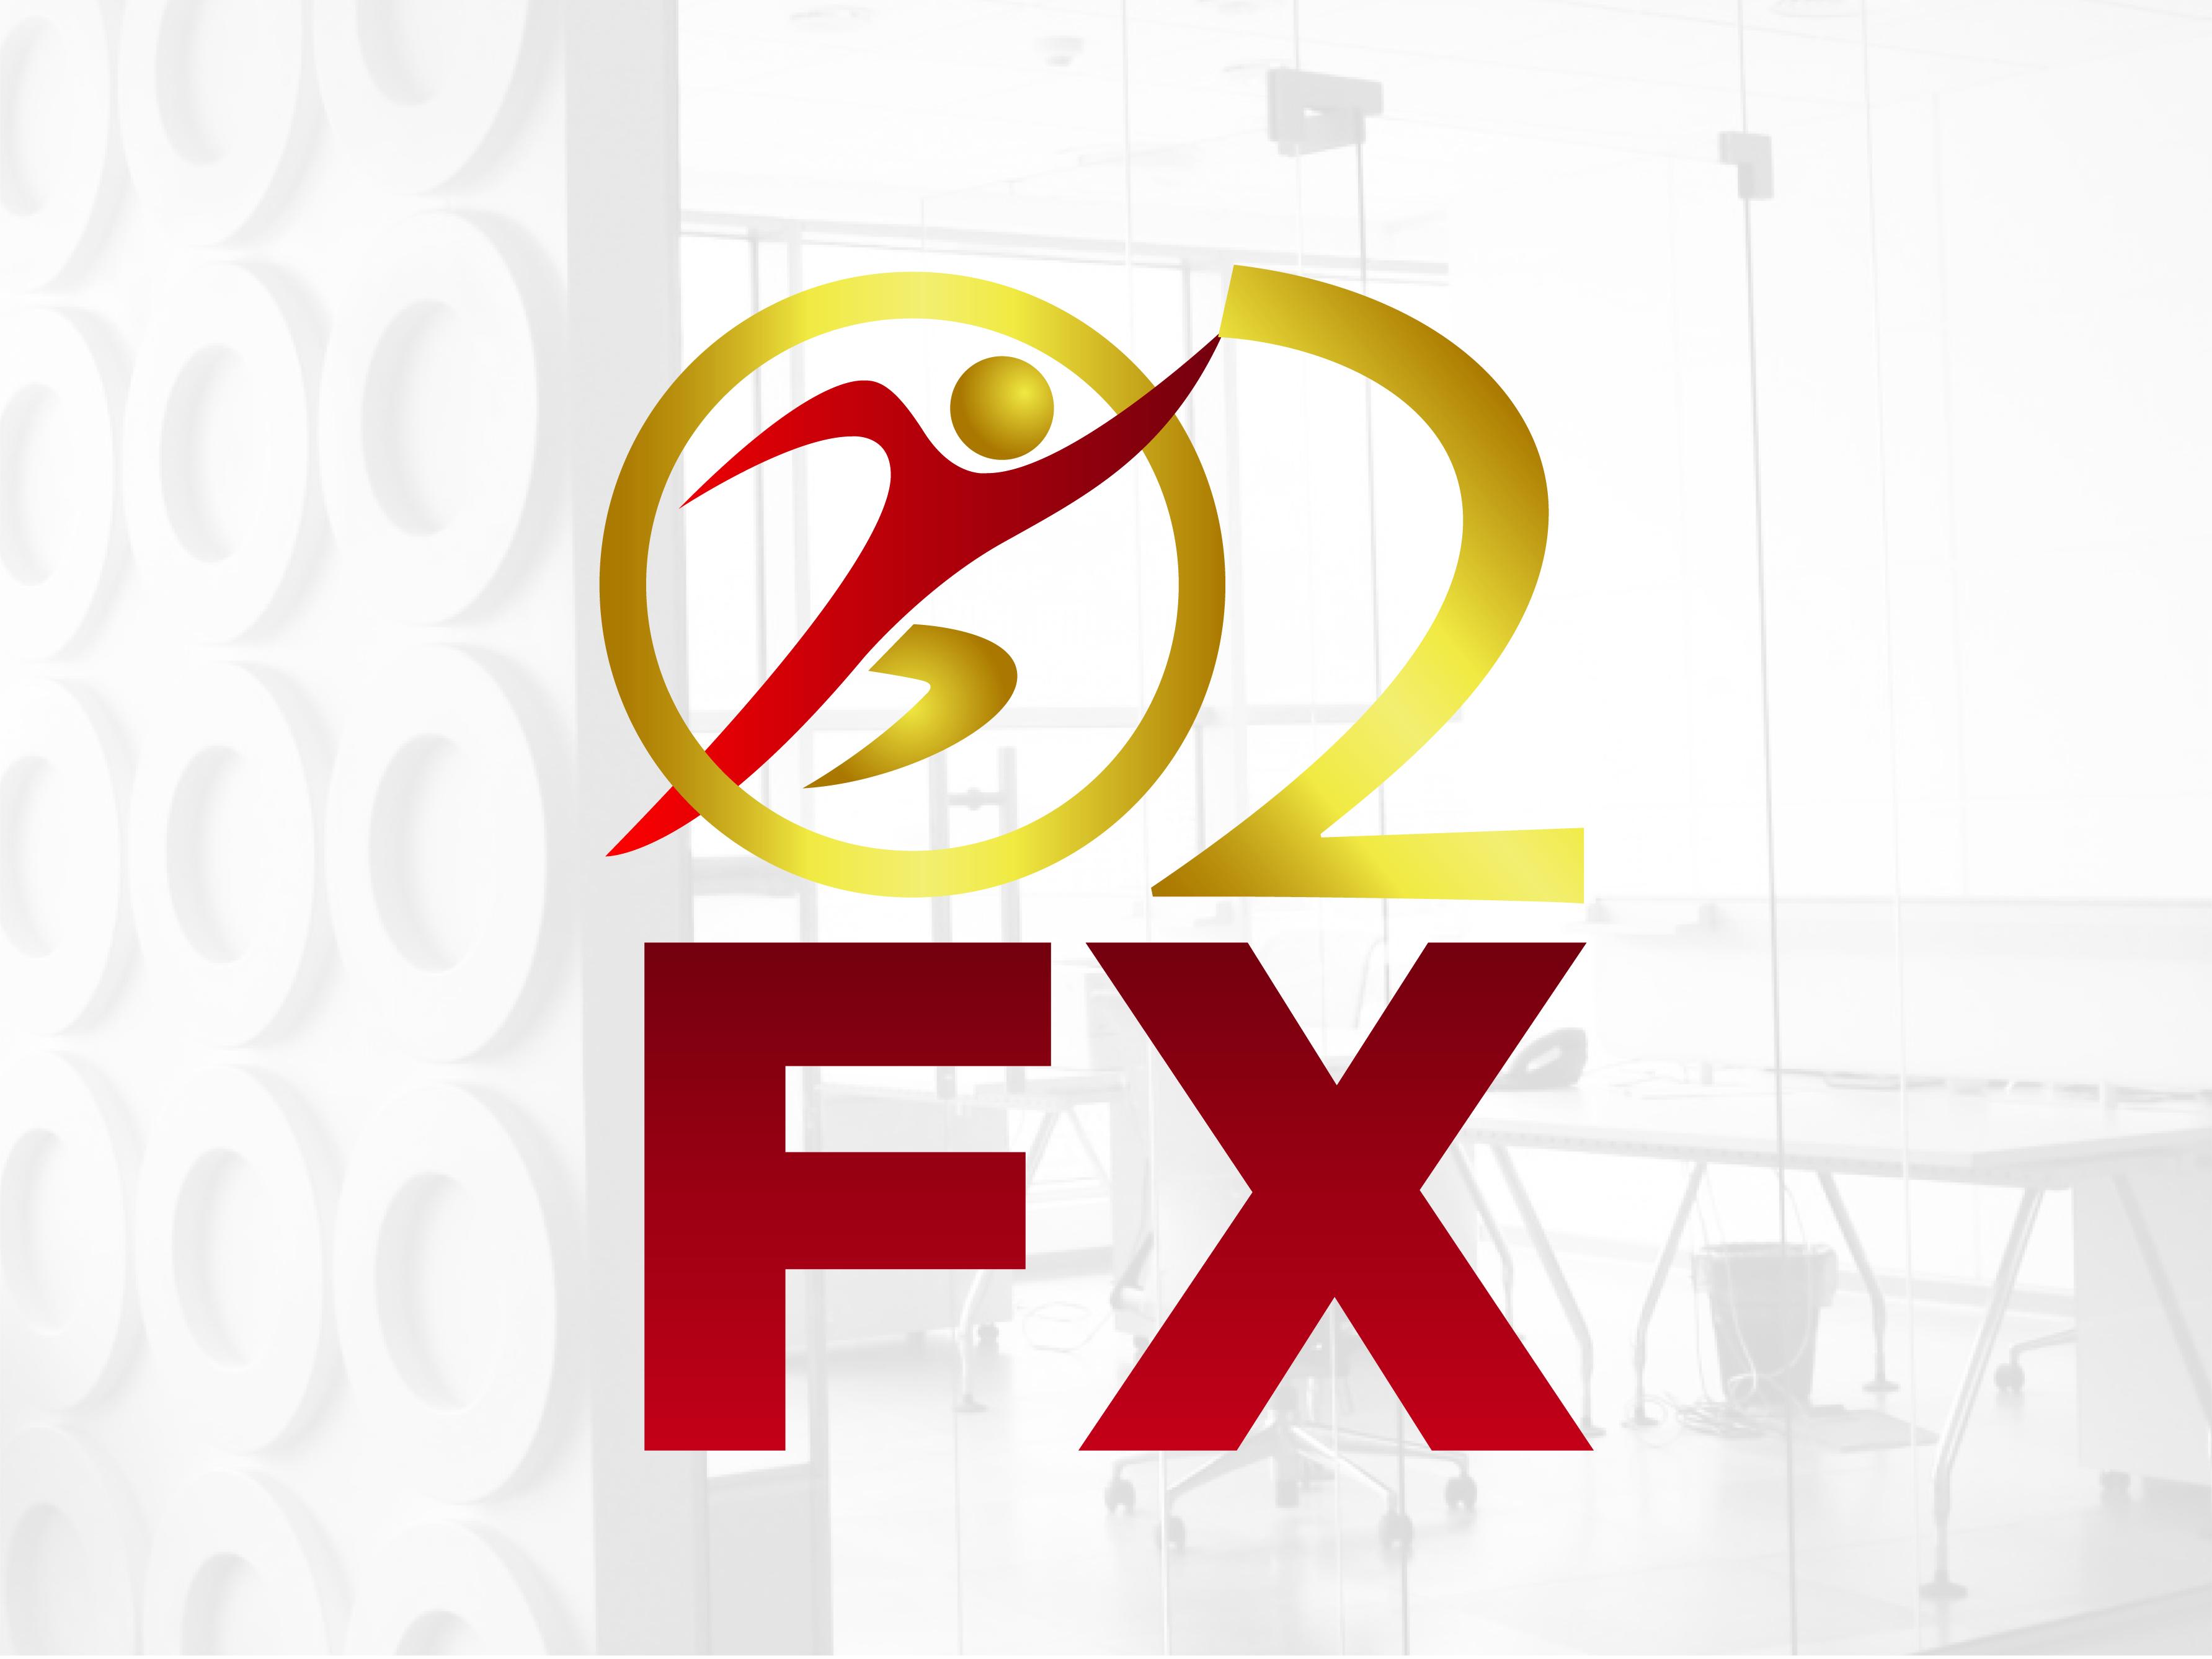 Logo Design by Rob King - Entry No. 85 in the Logo Design Contest Captivating Logo Design for O2FX.